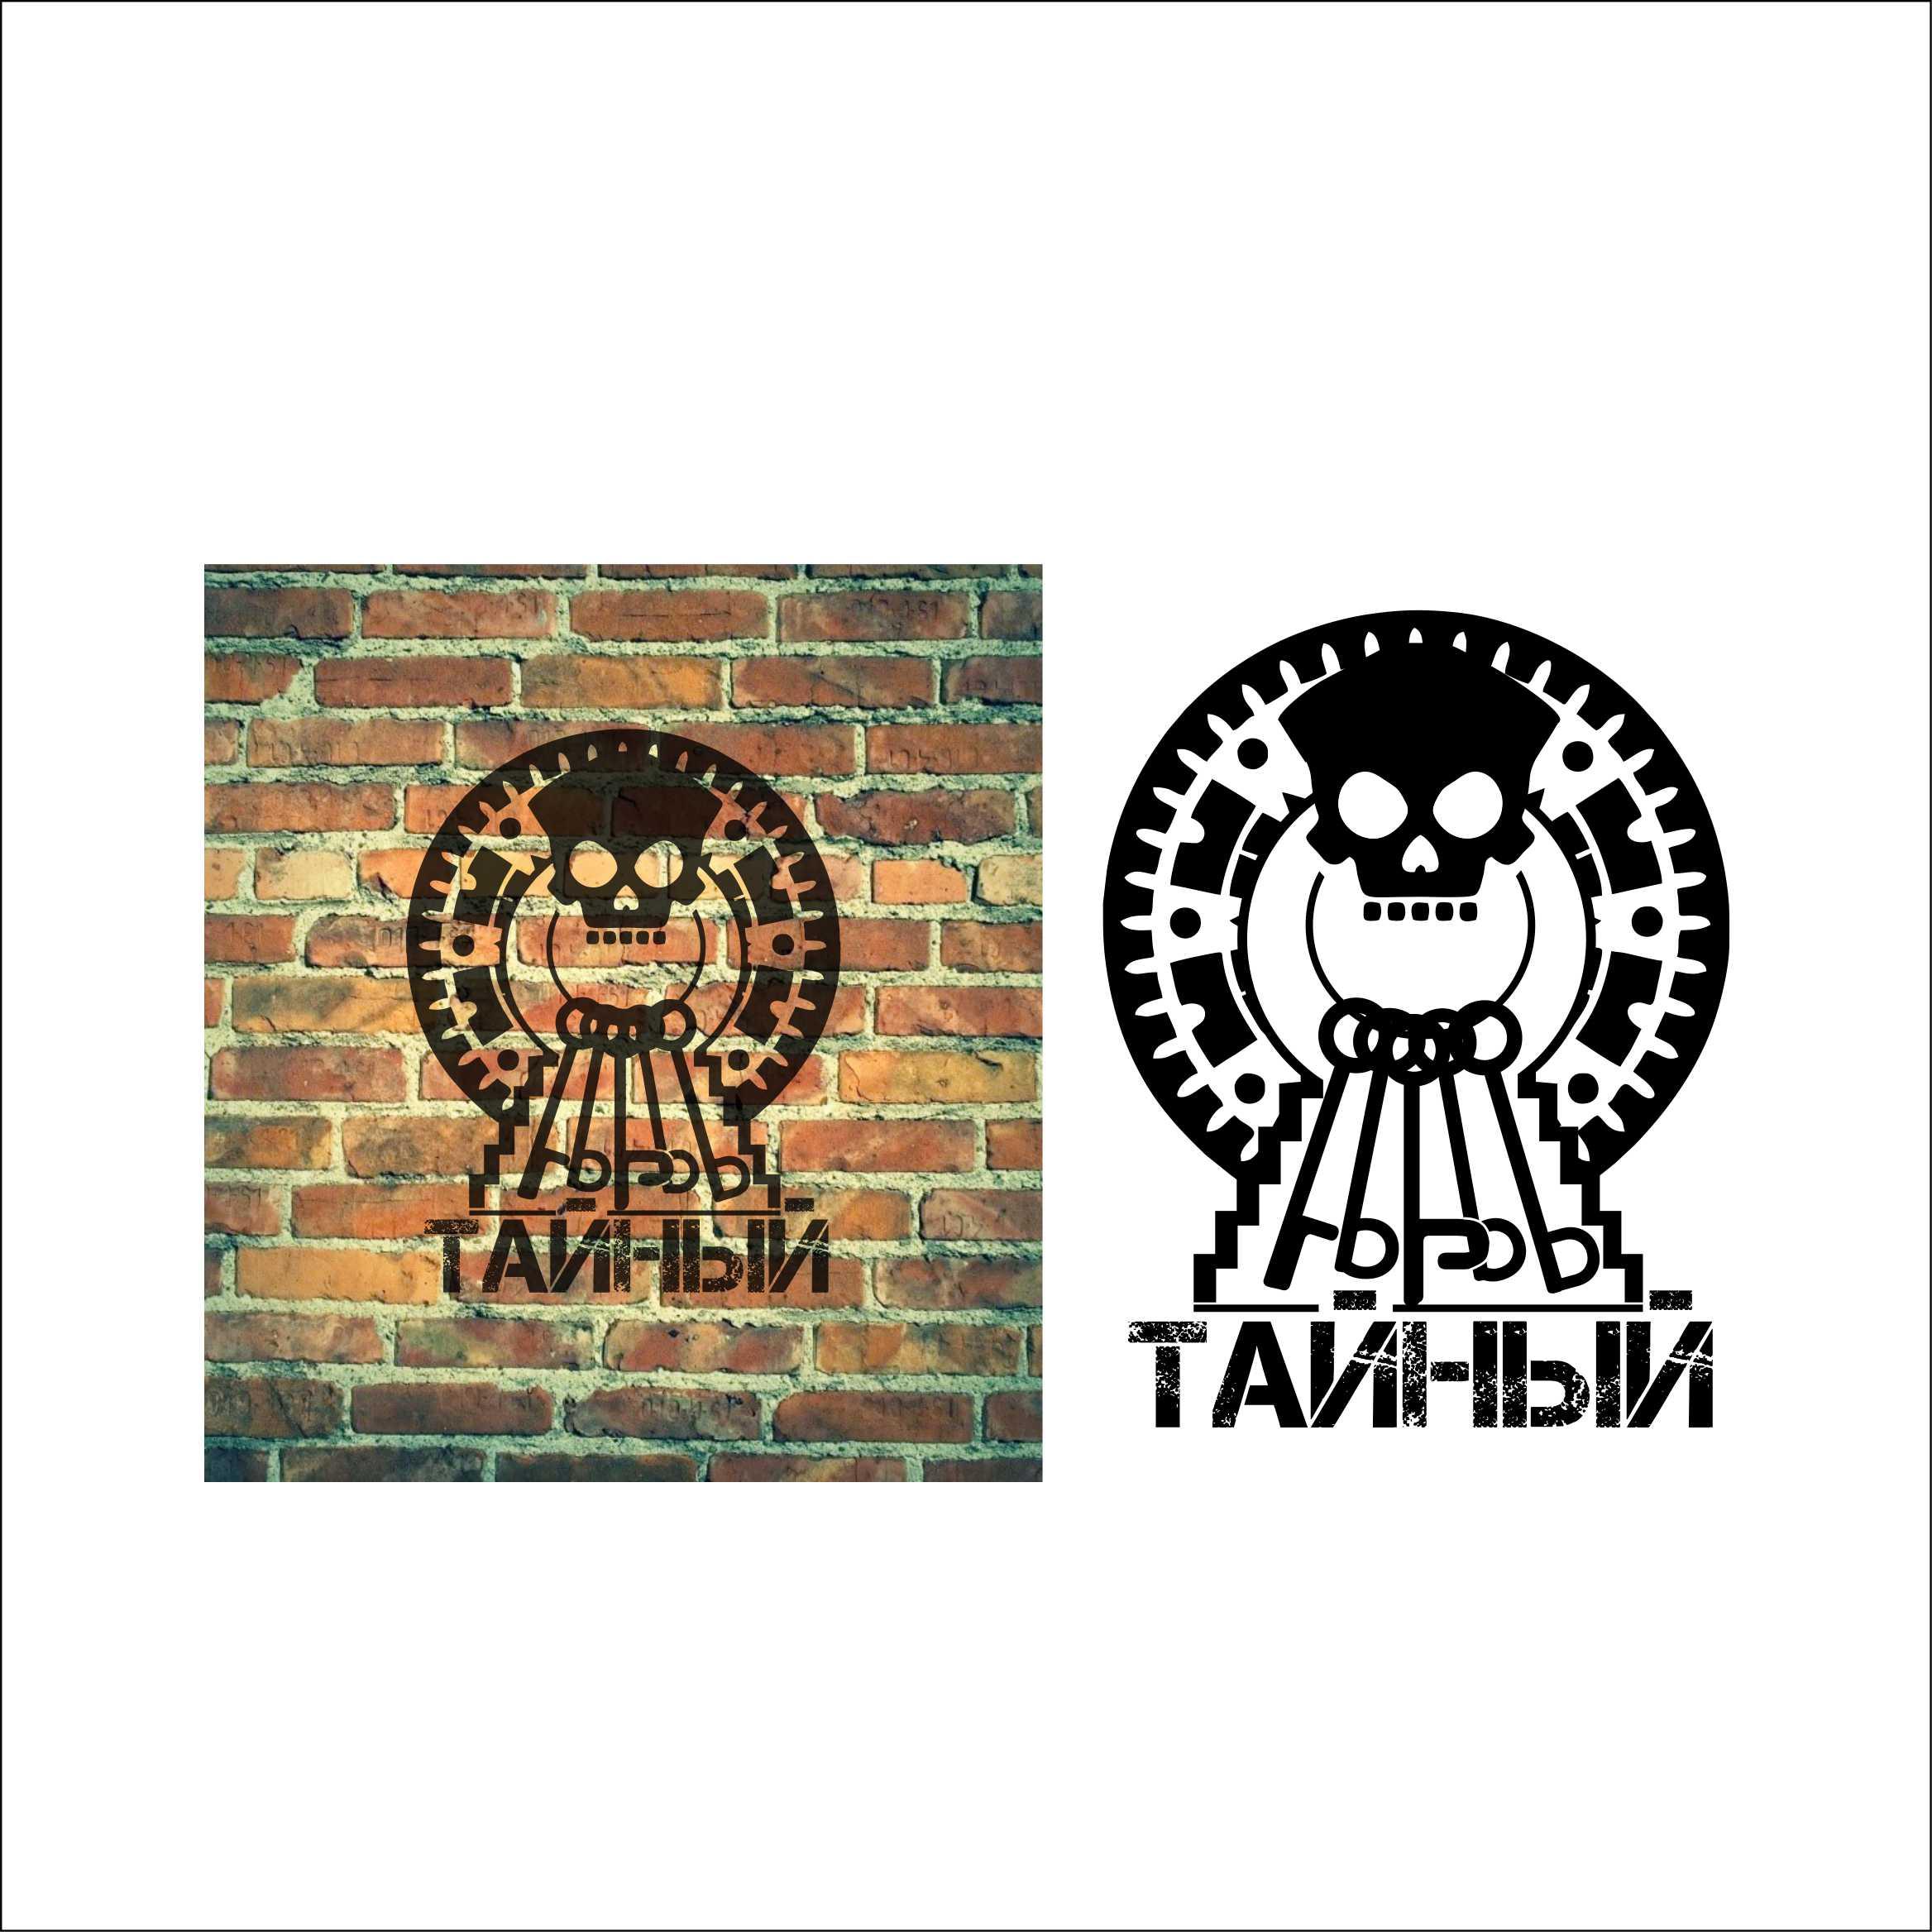 Разработка логотипа и шрифтов для Квеста  фото f_8845b46035266dcb.jpg